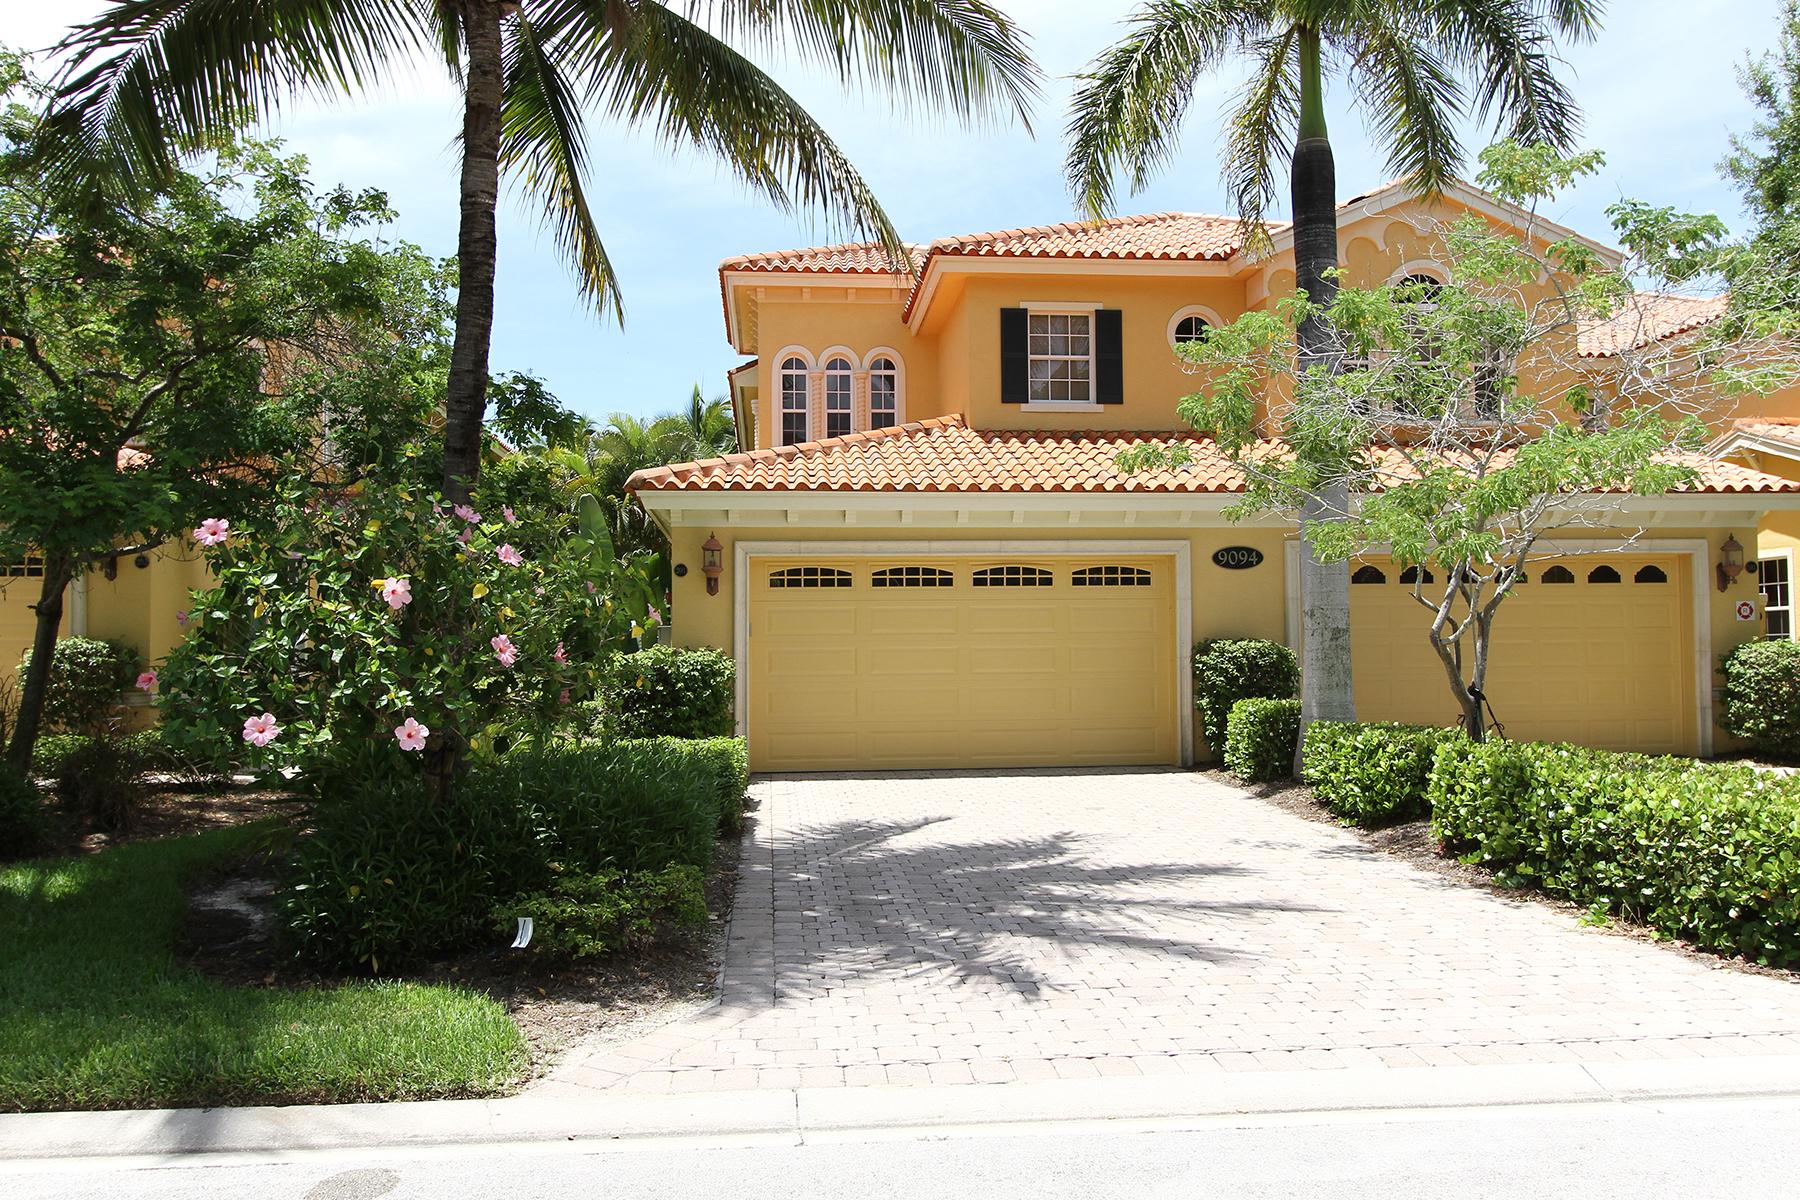 Condominium for Rent at FIDDLERS CREEK - CASADA 9094 Cascada Way 201, Naples, Florida 34114 United States